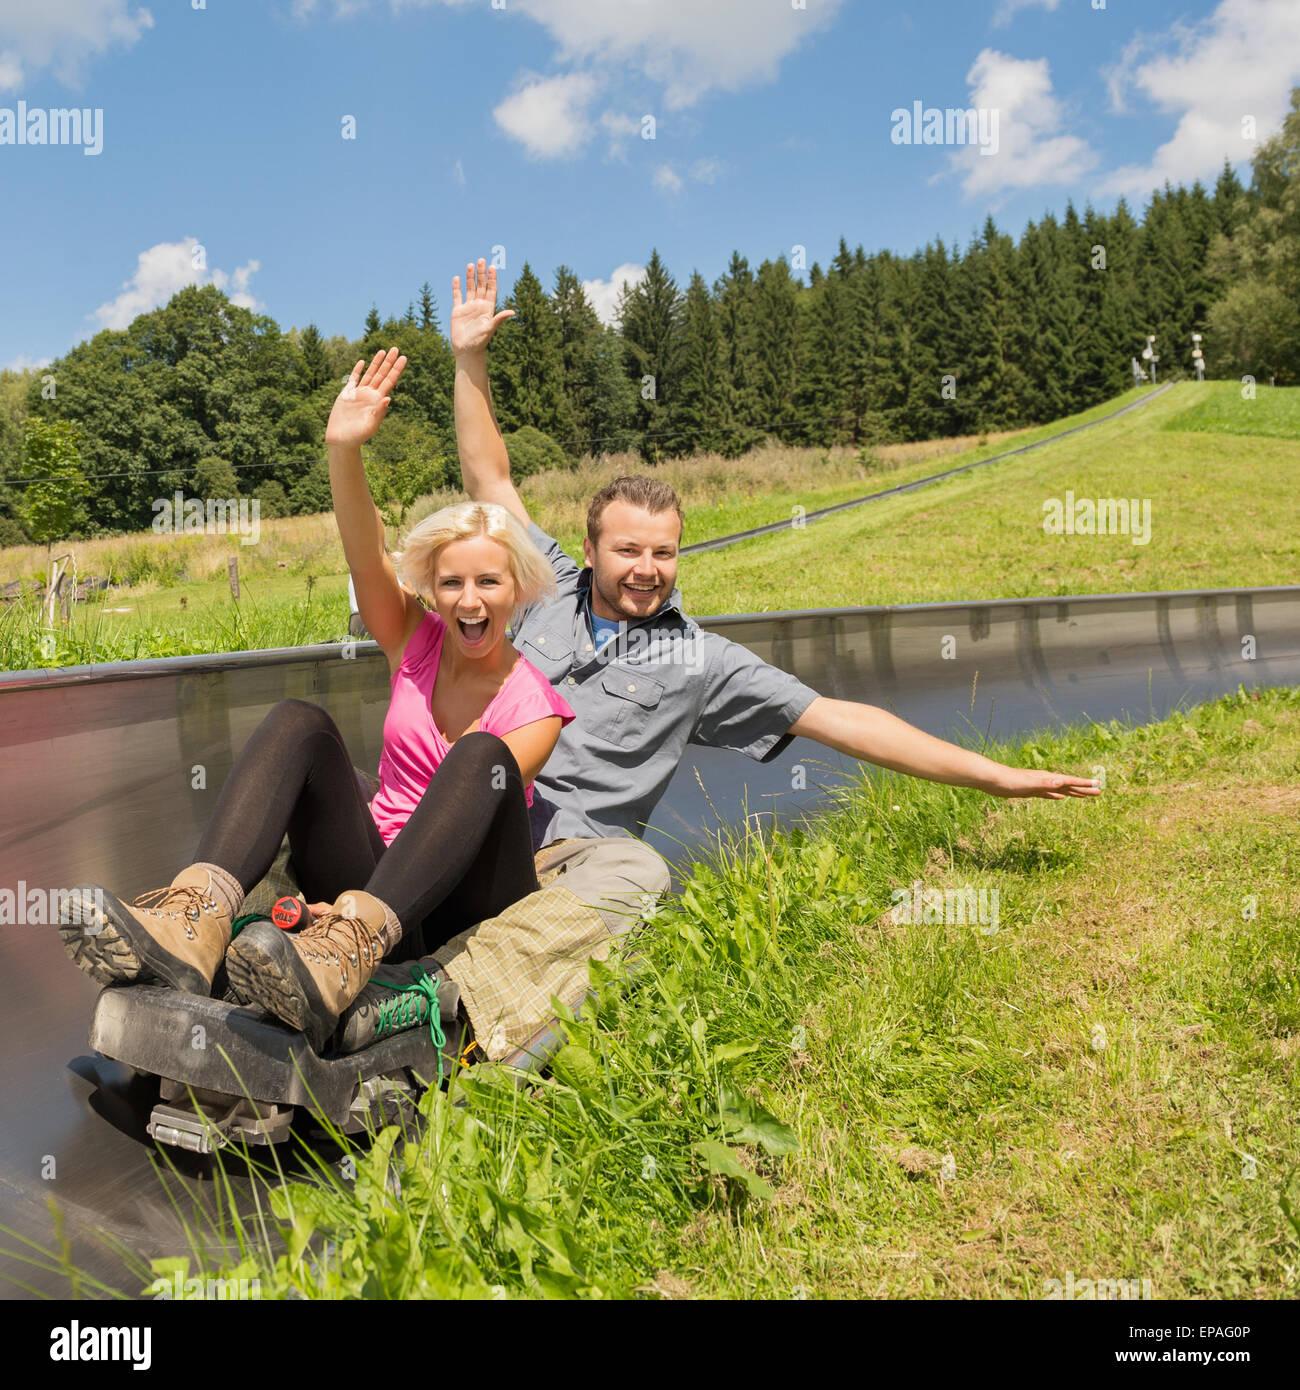 Couple Enjoying Their Summer Holidays Stock Photo: Couple Enjoying Summer Sledge Stock Photo: 82595990